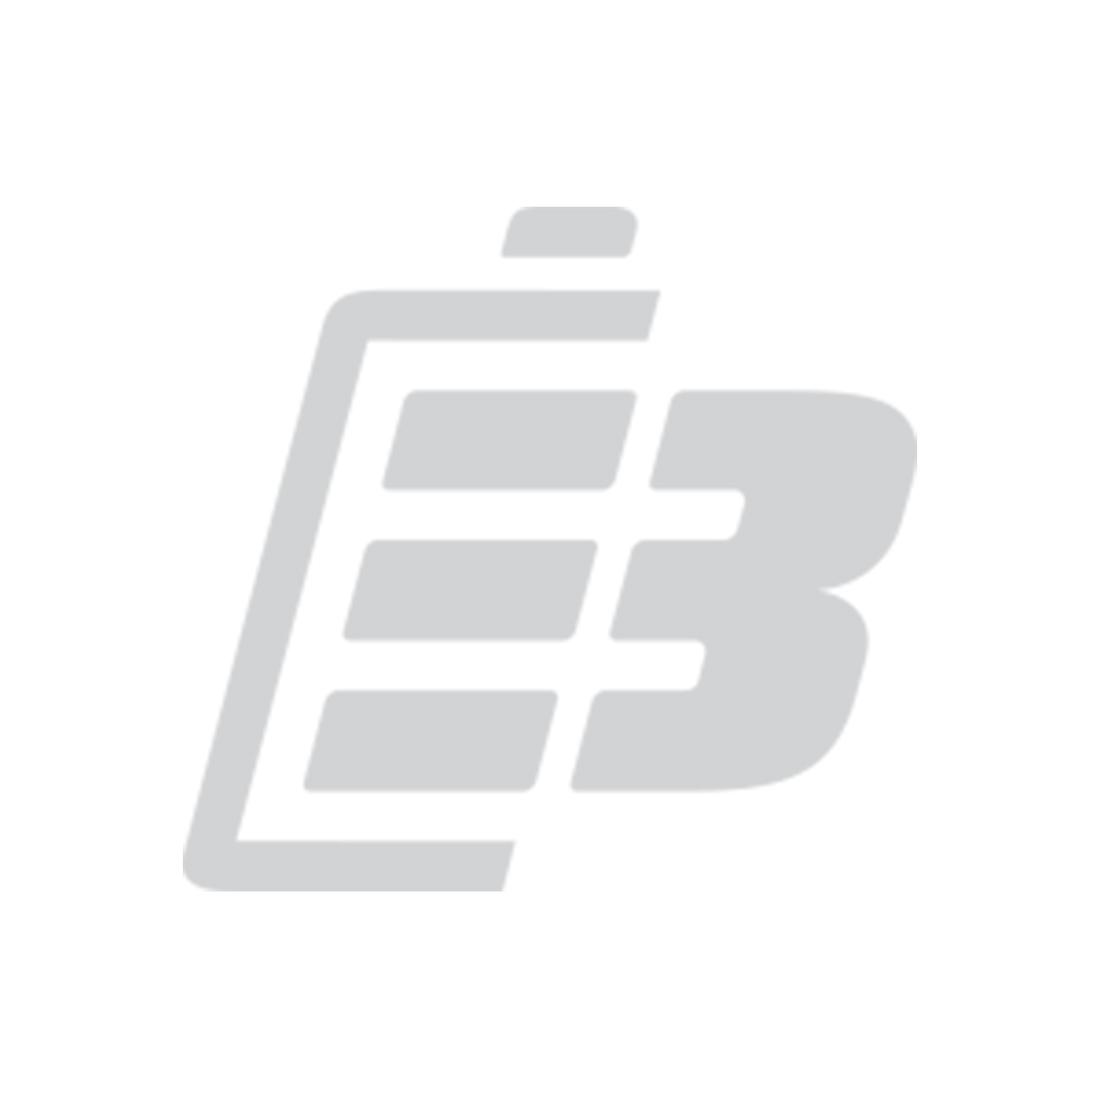 DURACELL-ULTRA-CR2